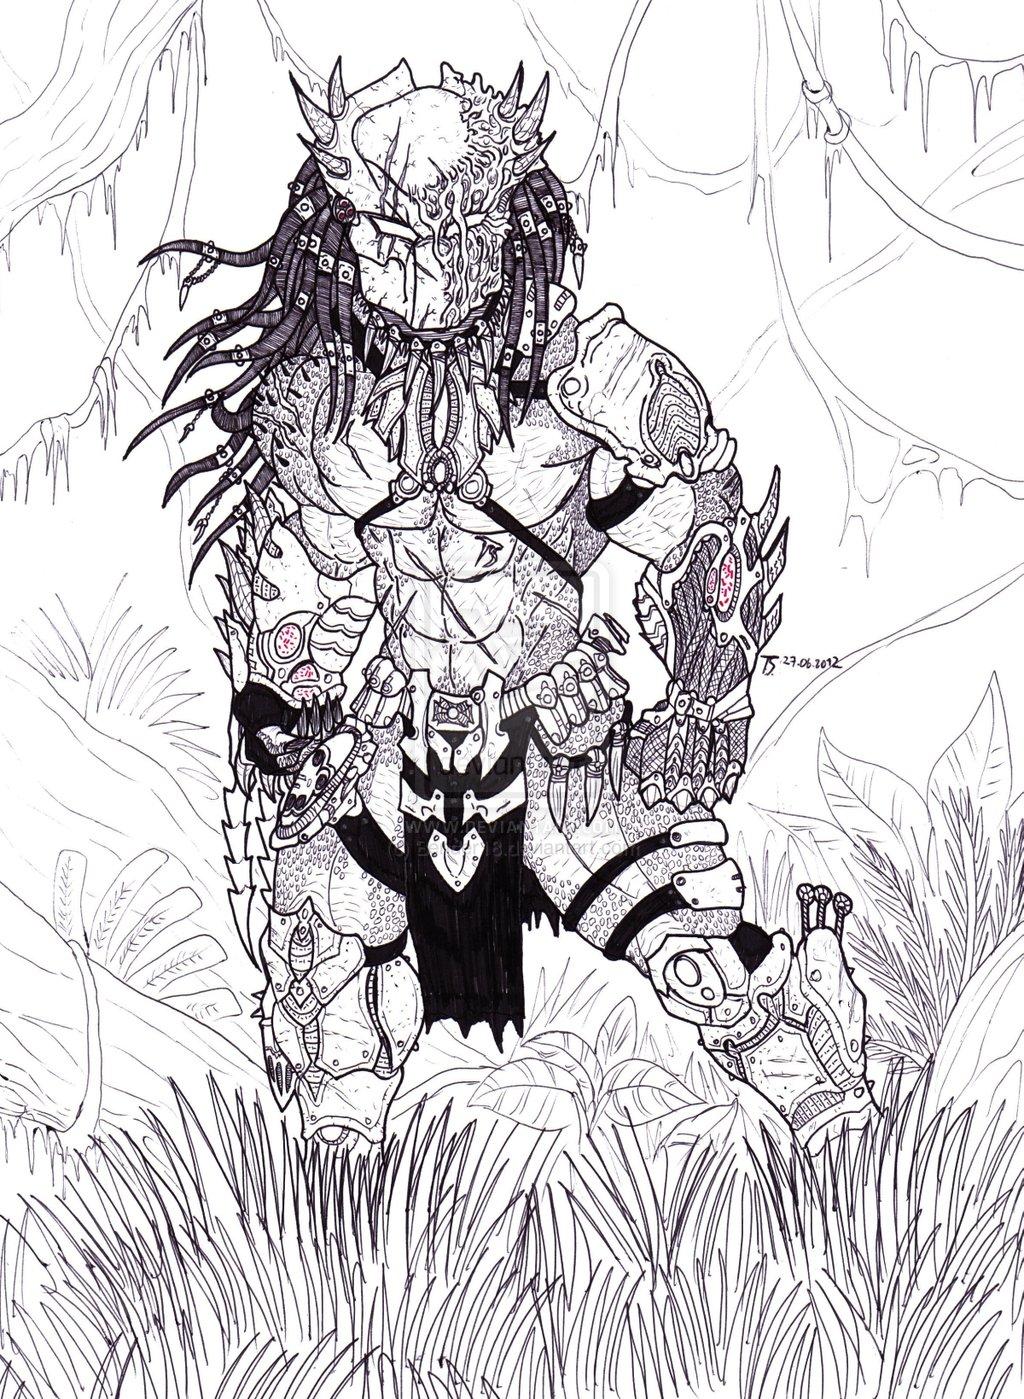 Drawn predator wolf Pic/pic ever  Predator of